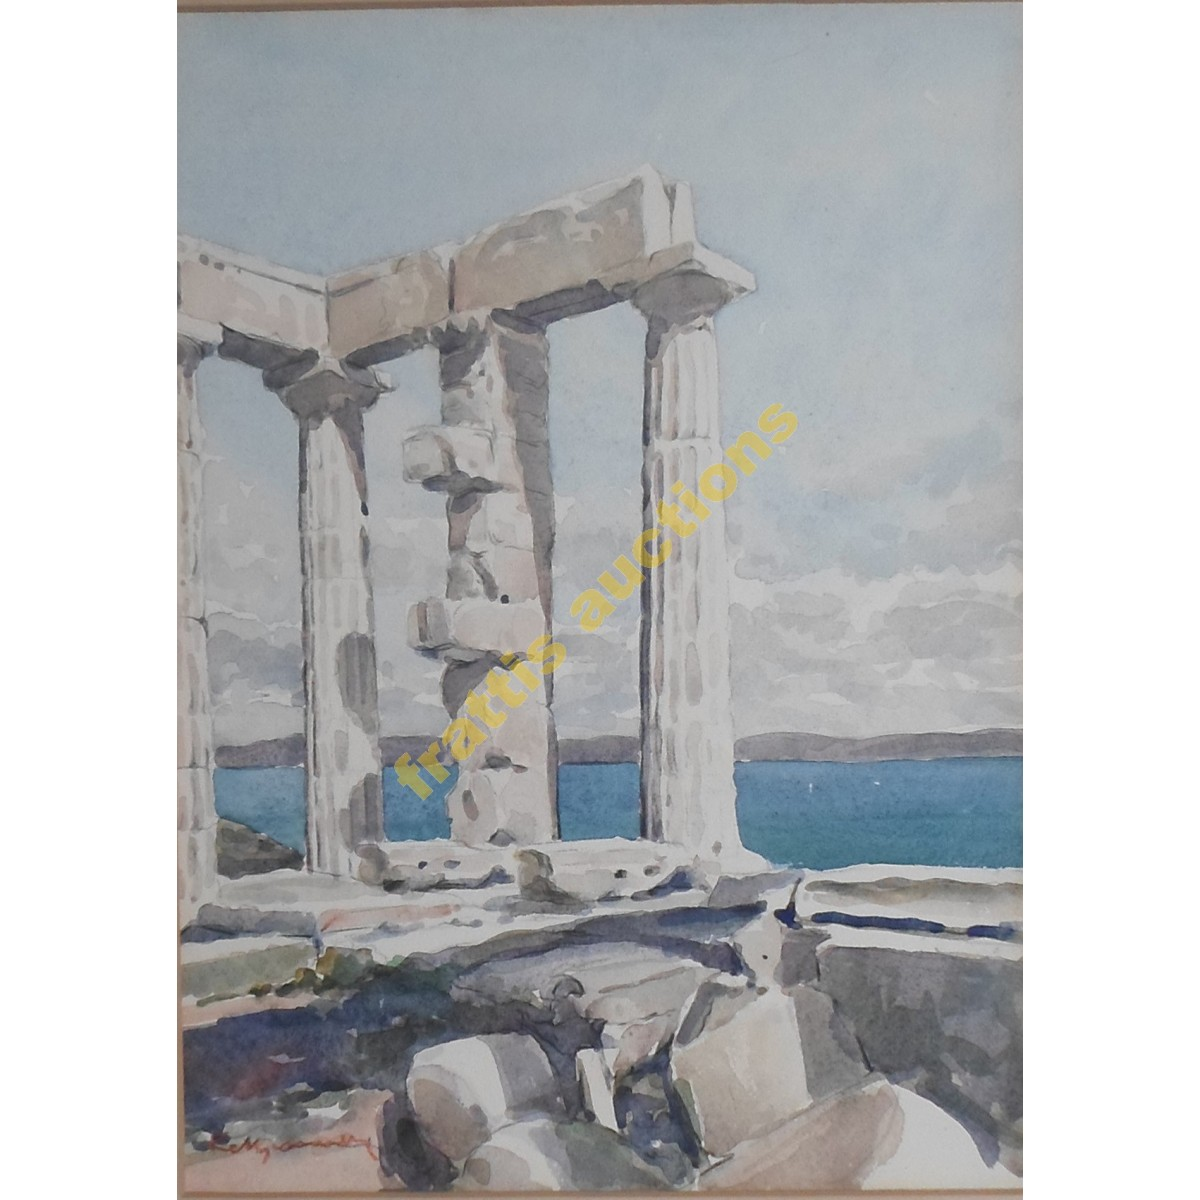 E.Manamy, Greek ruins above a bay